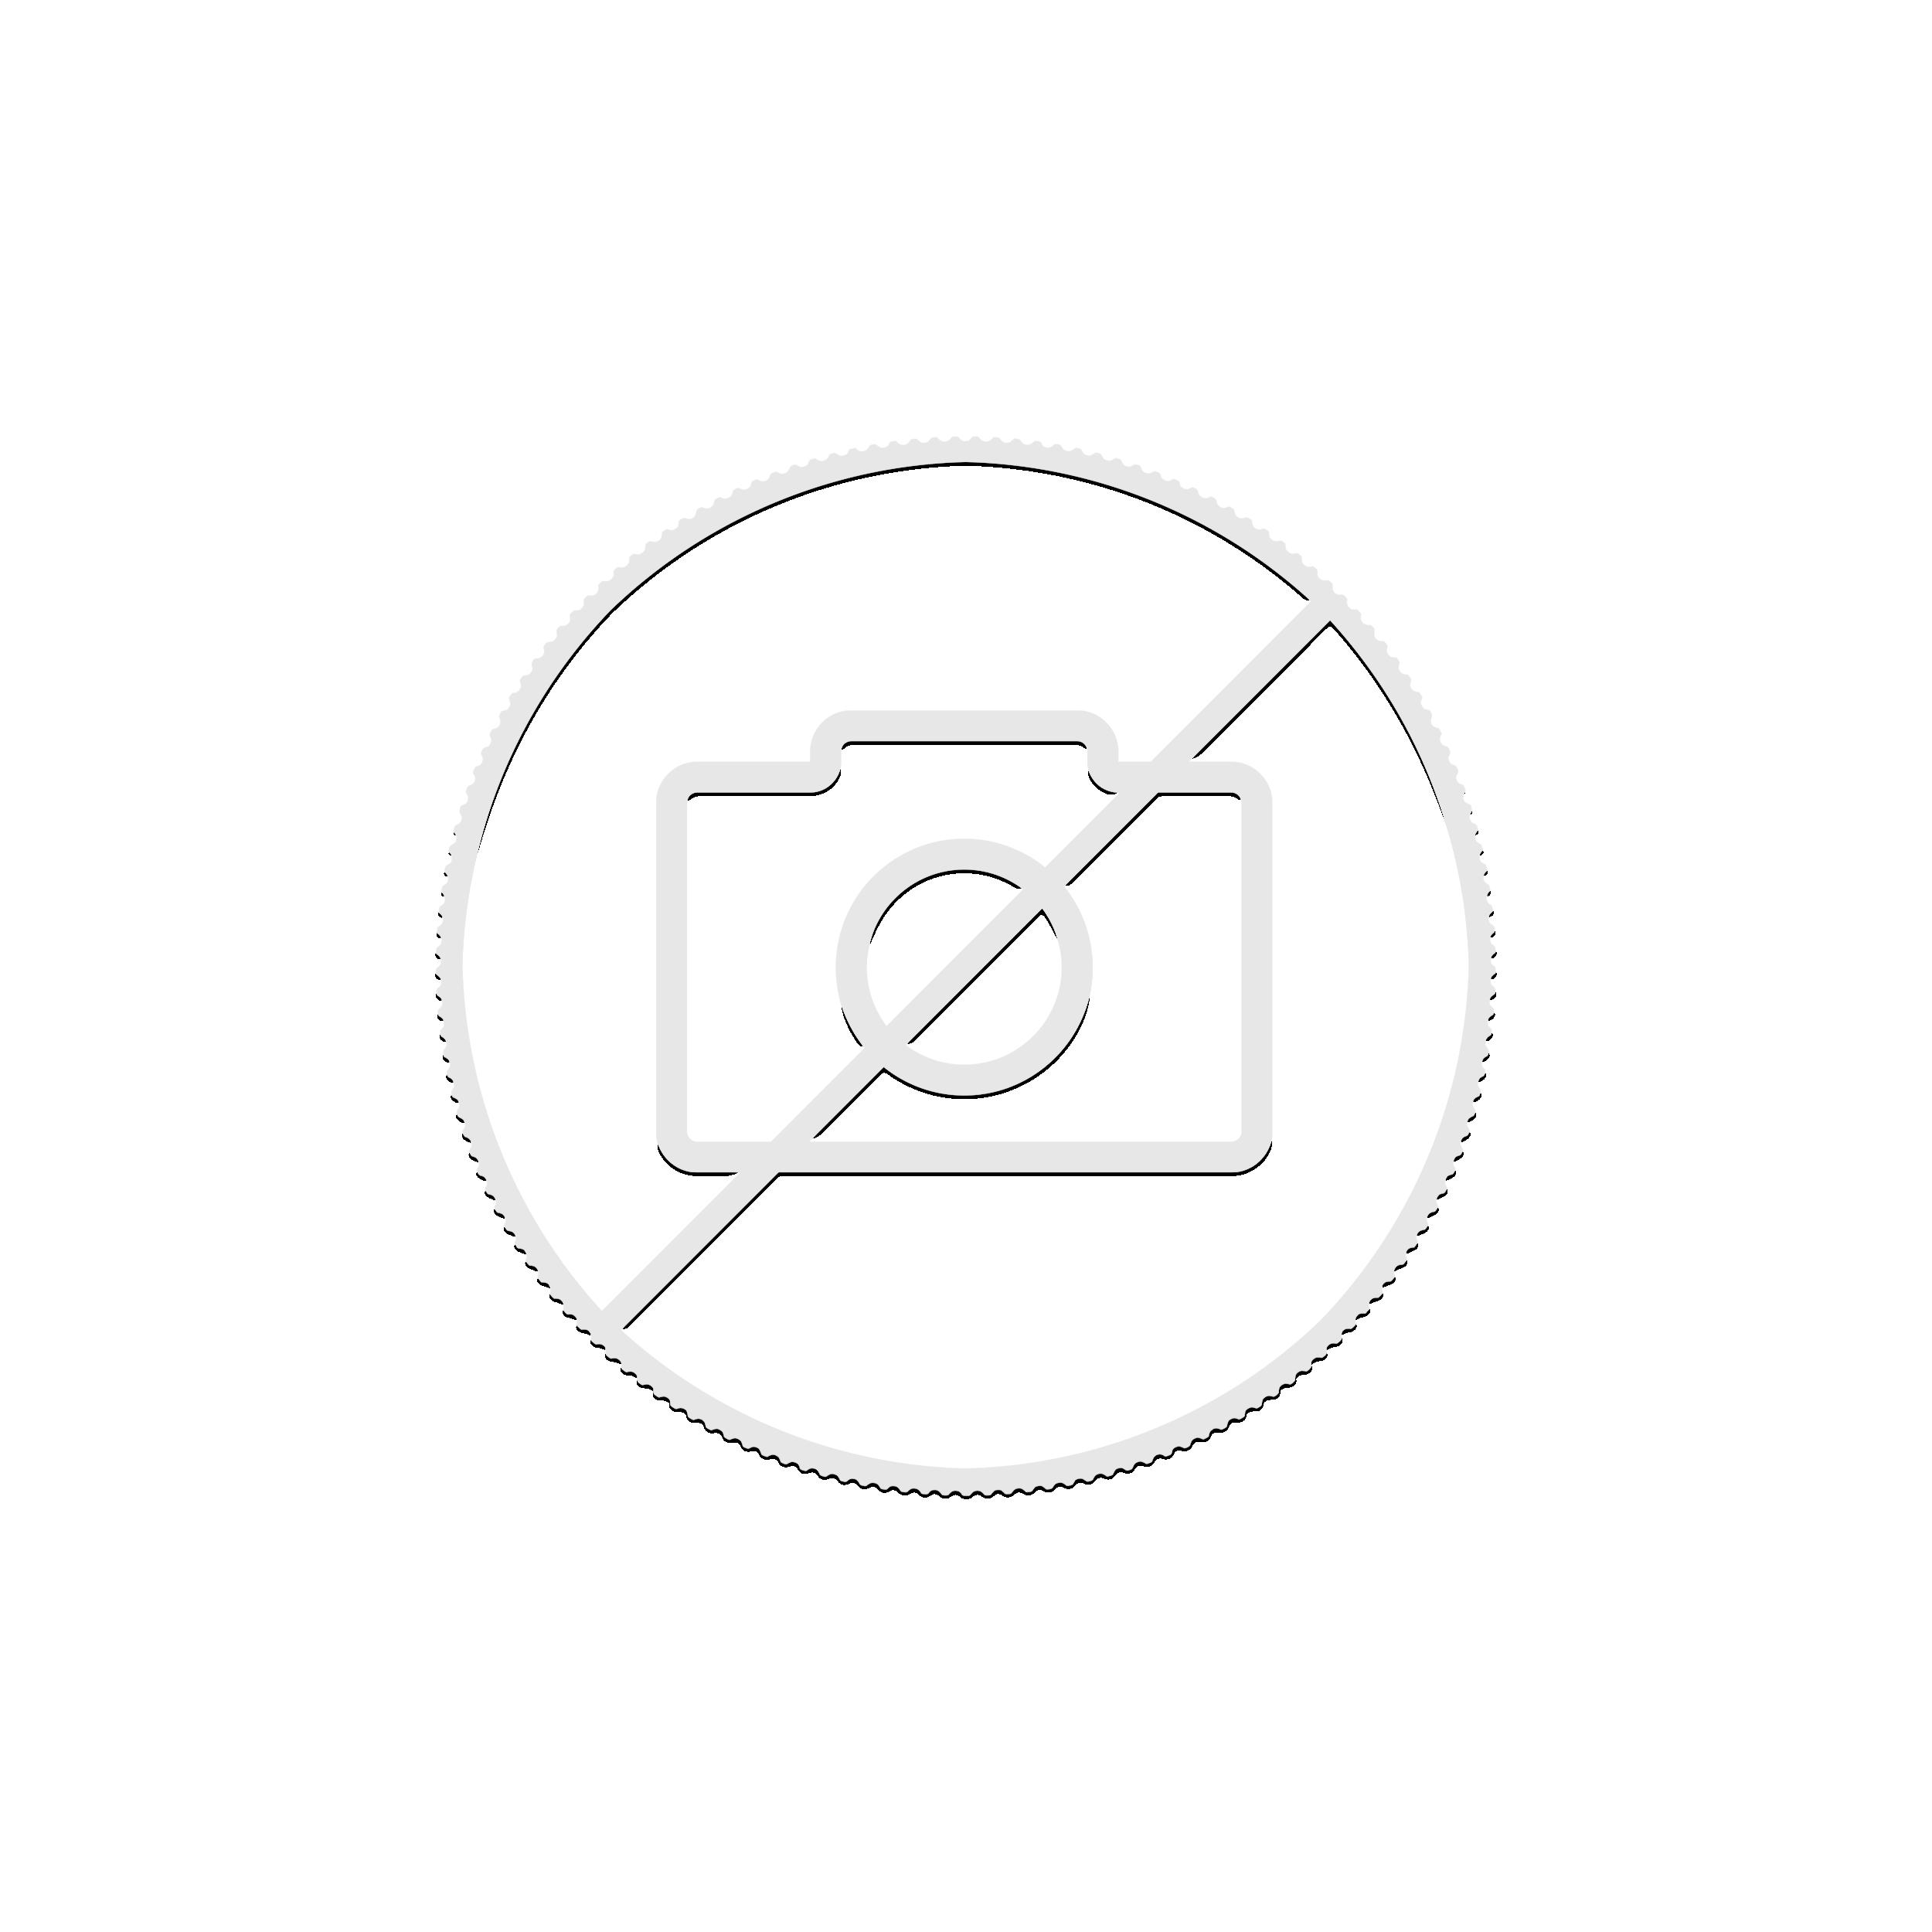 1 Troy ounce platina Kangaroo munt 2021